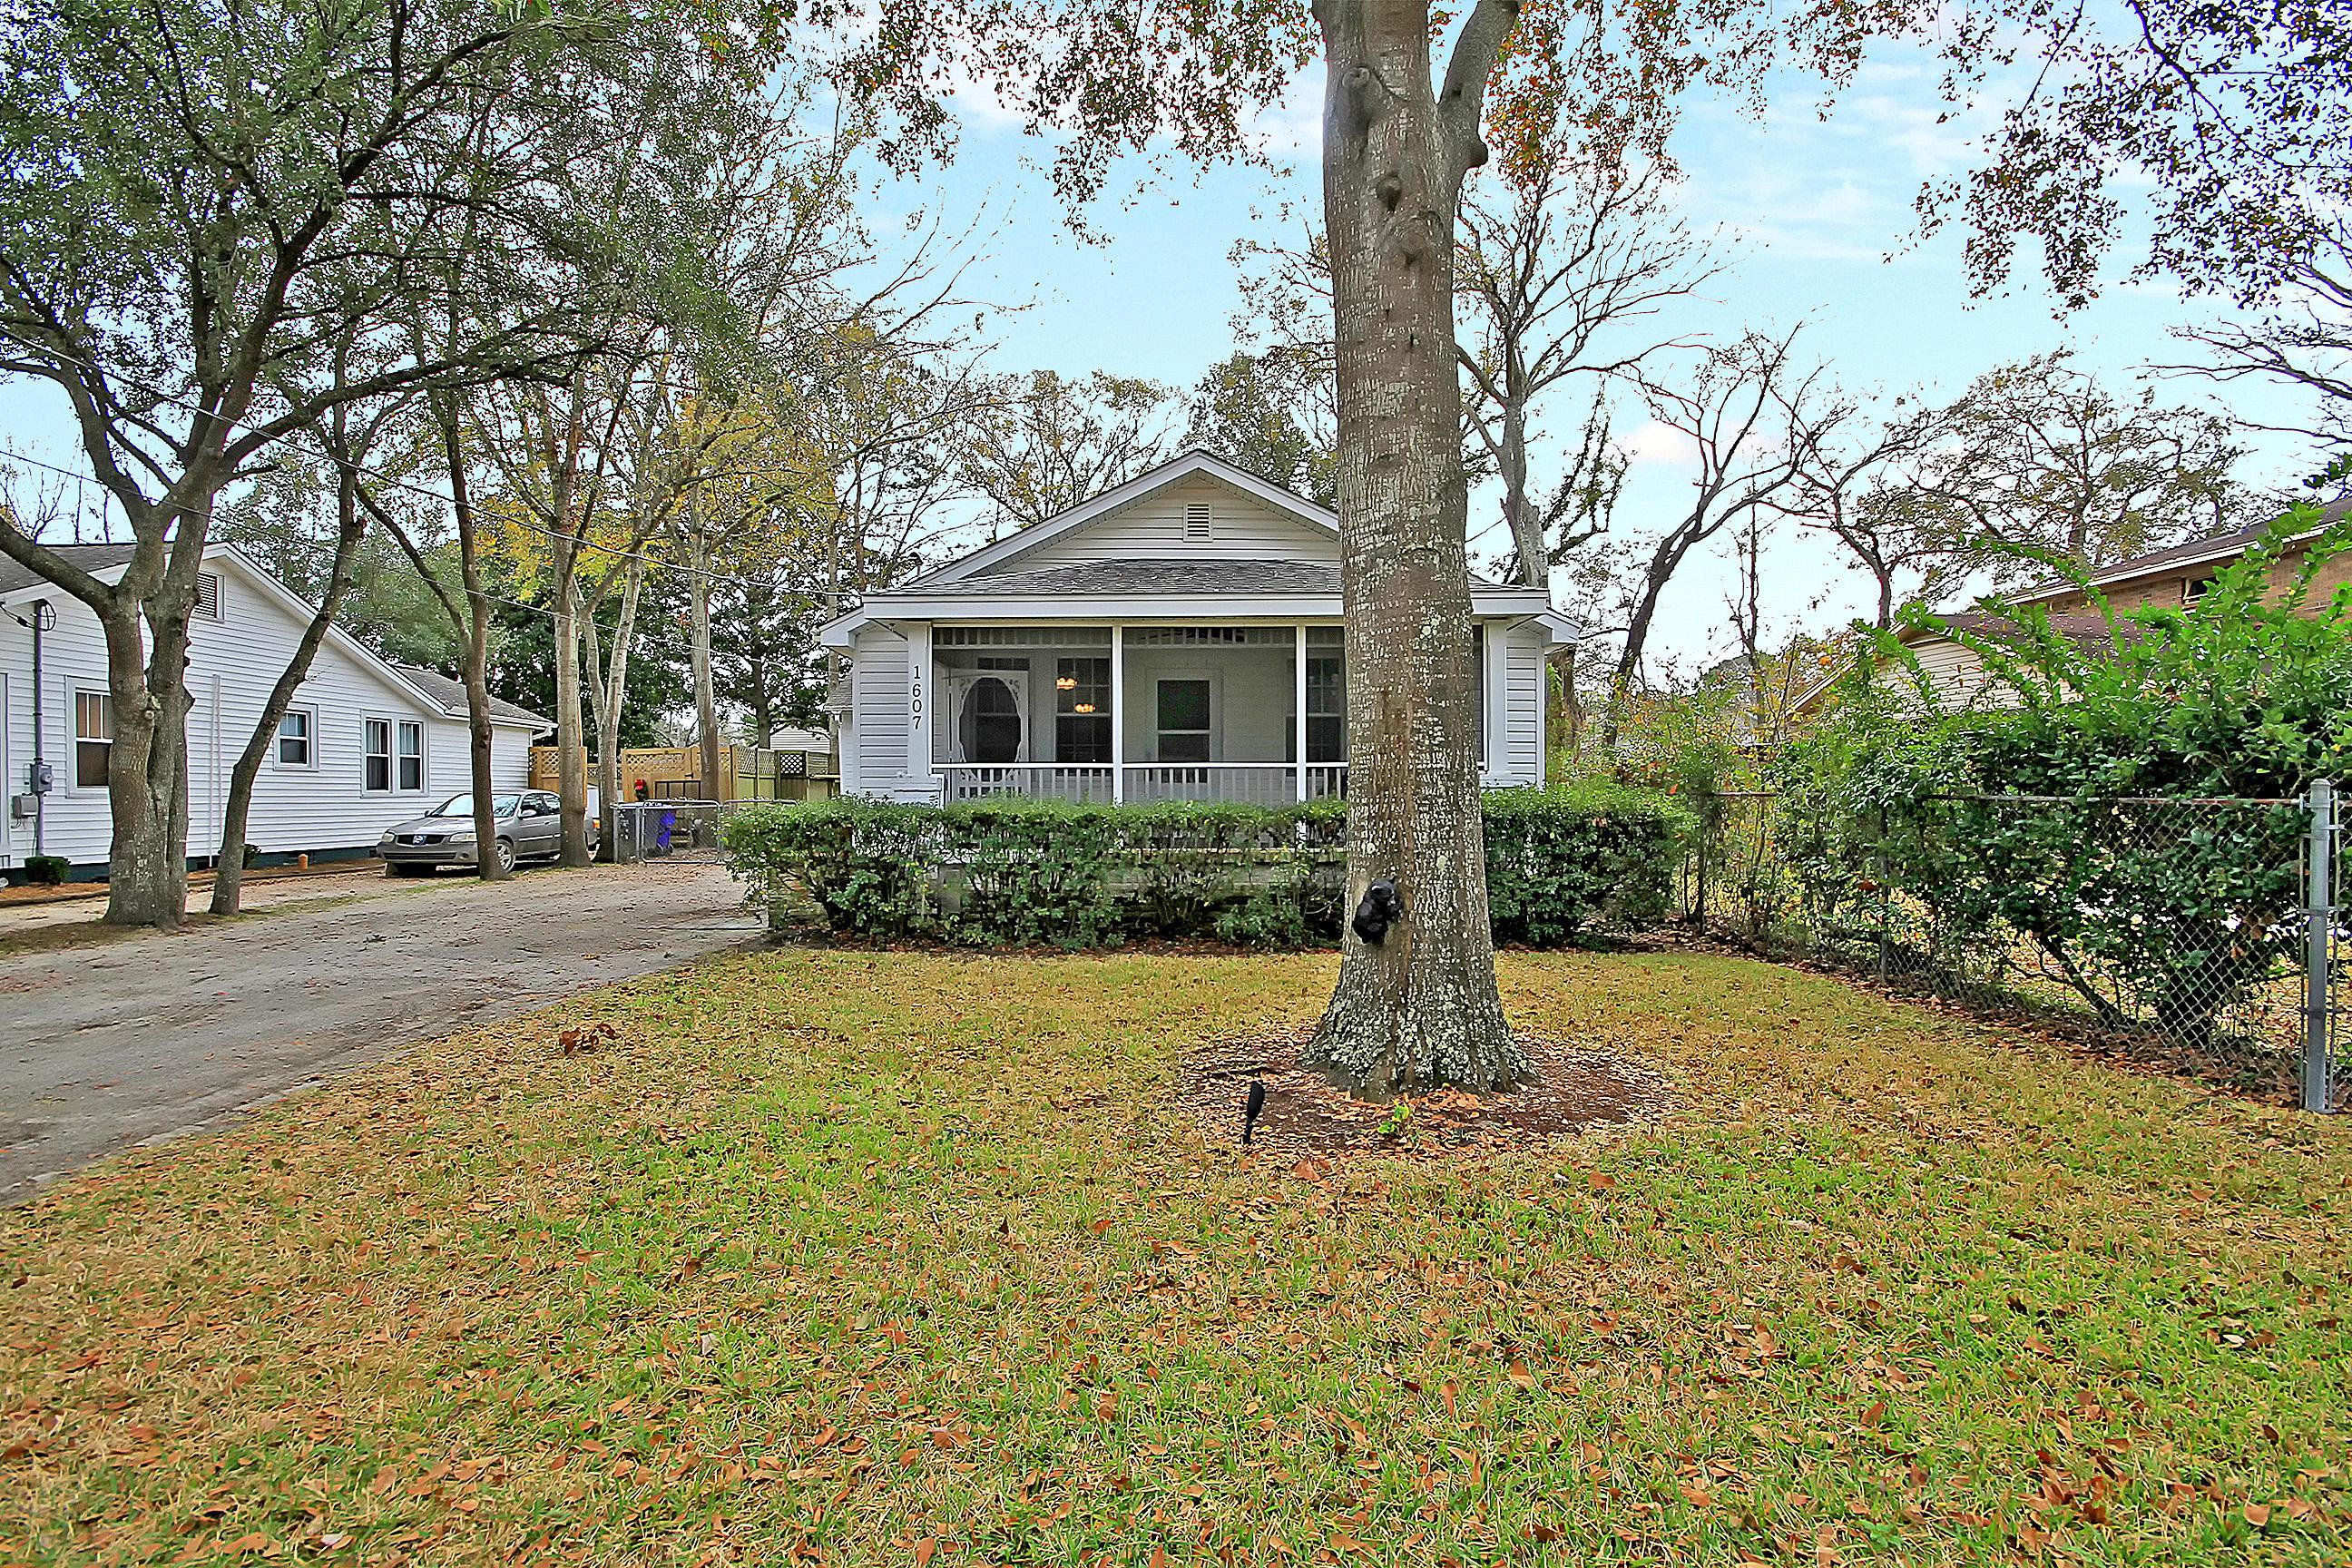 Pinecrest Gardens Homes For Sale - 1607 Pinecrest, Charleston, SC - 14